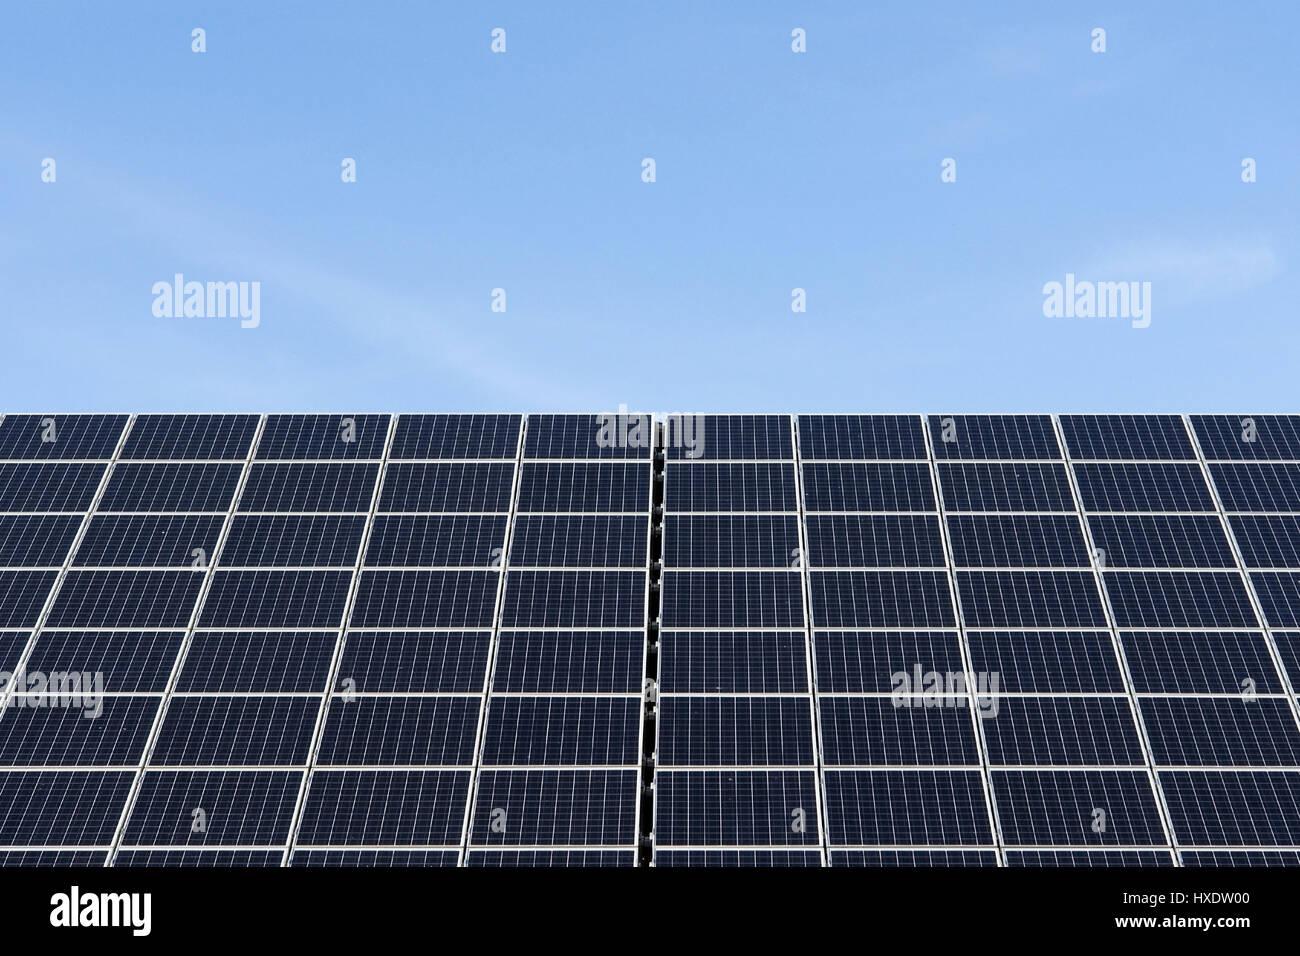 Solar cells, Solar cells |, Solarzellen |Solar cells| - Stock Image